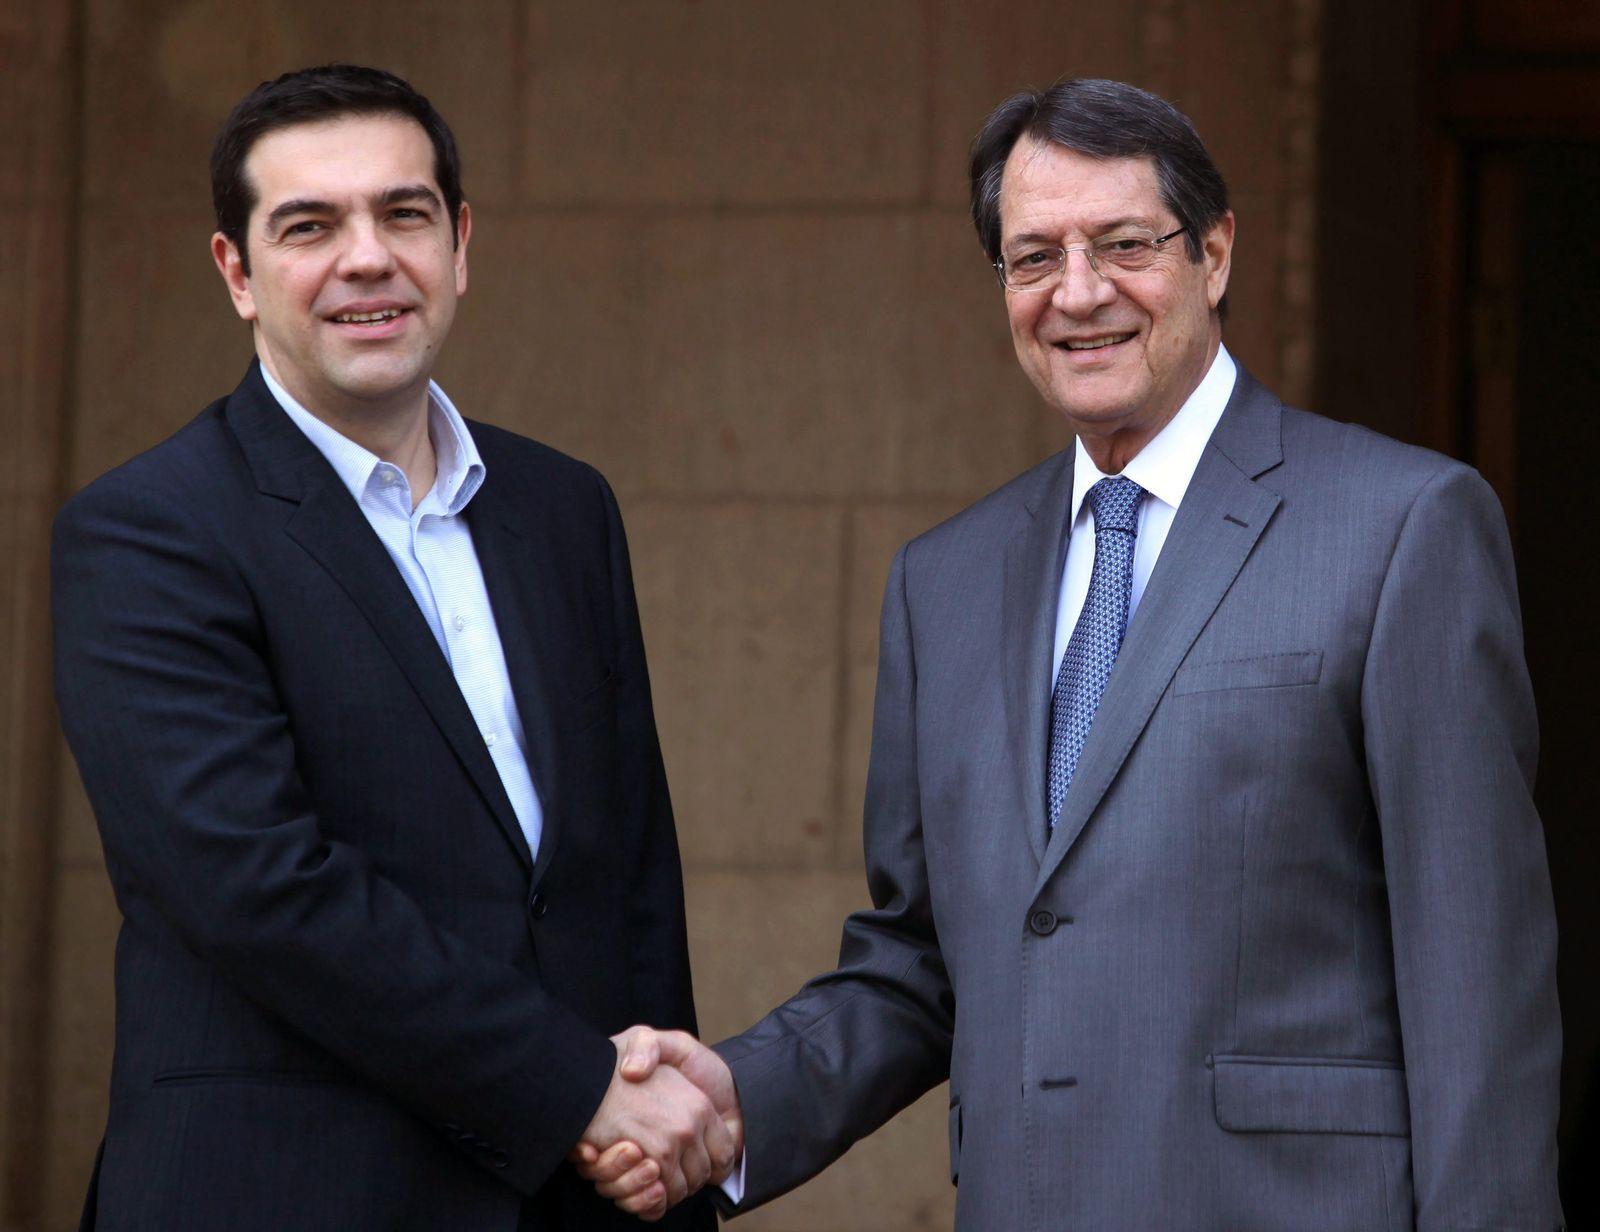 Tsipras / Anastasiadis